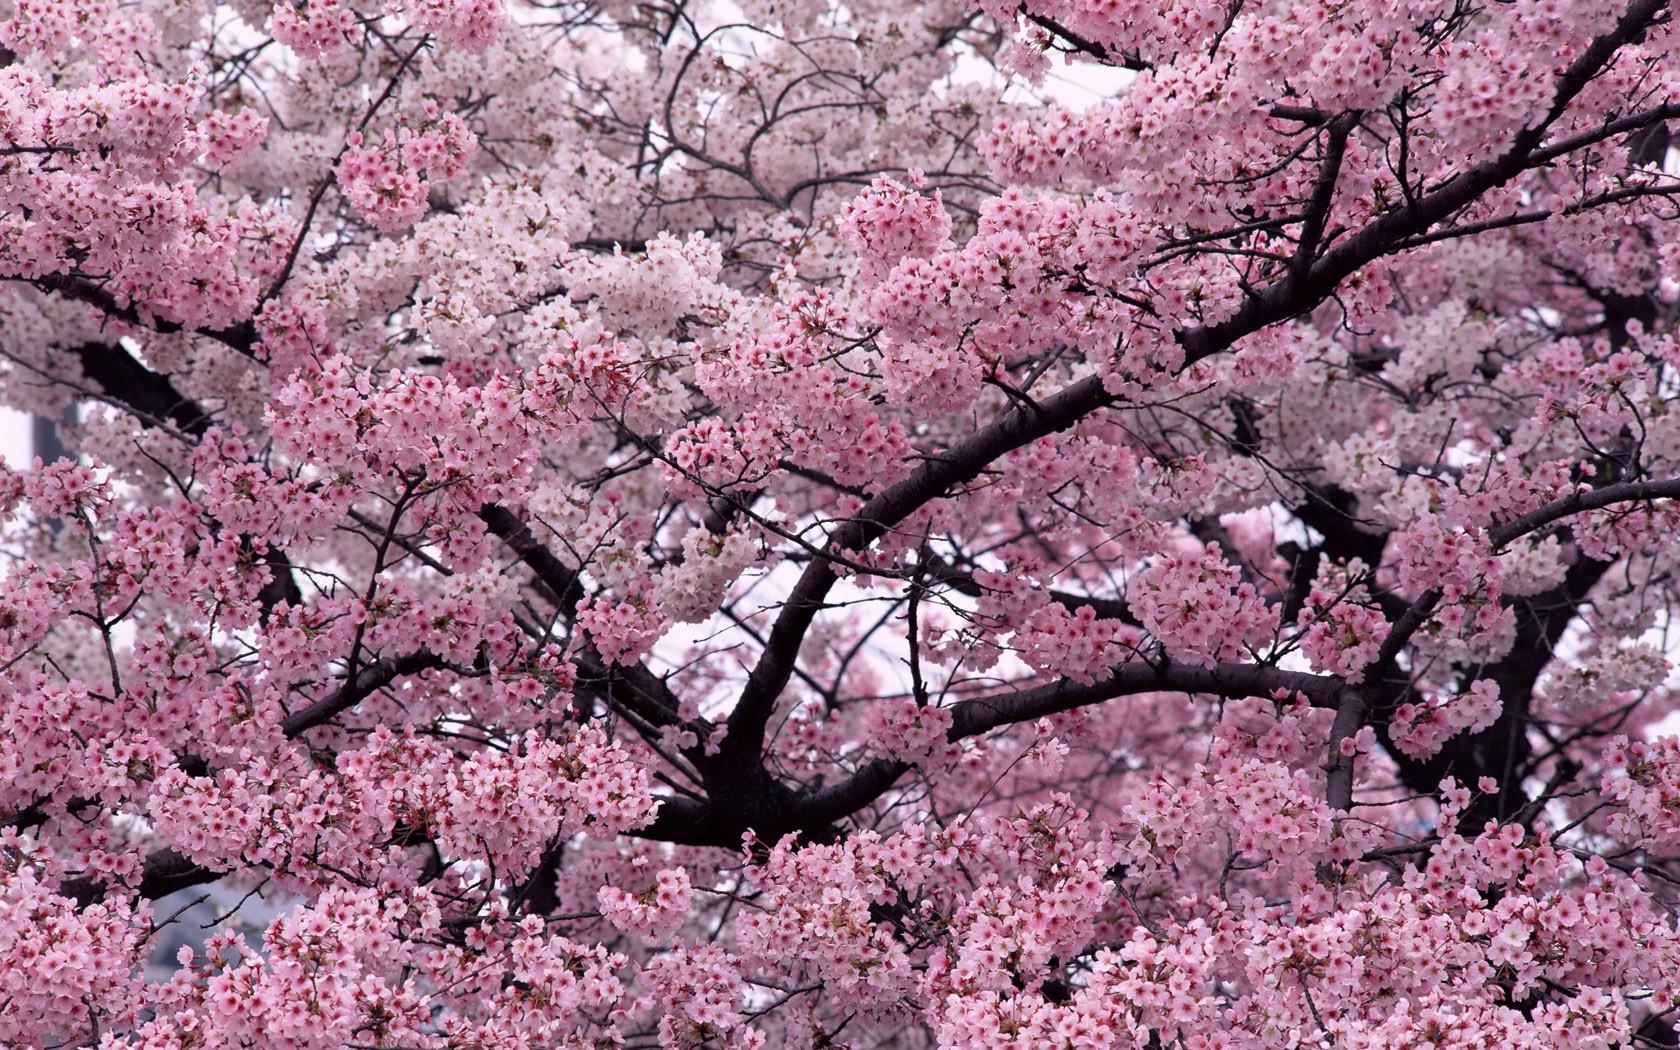 wallpaper 1680x1050 px cherry blossom flowers nature